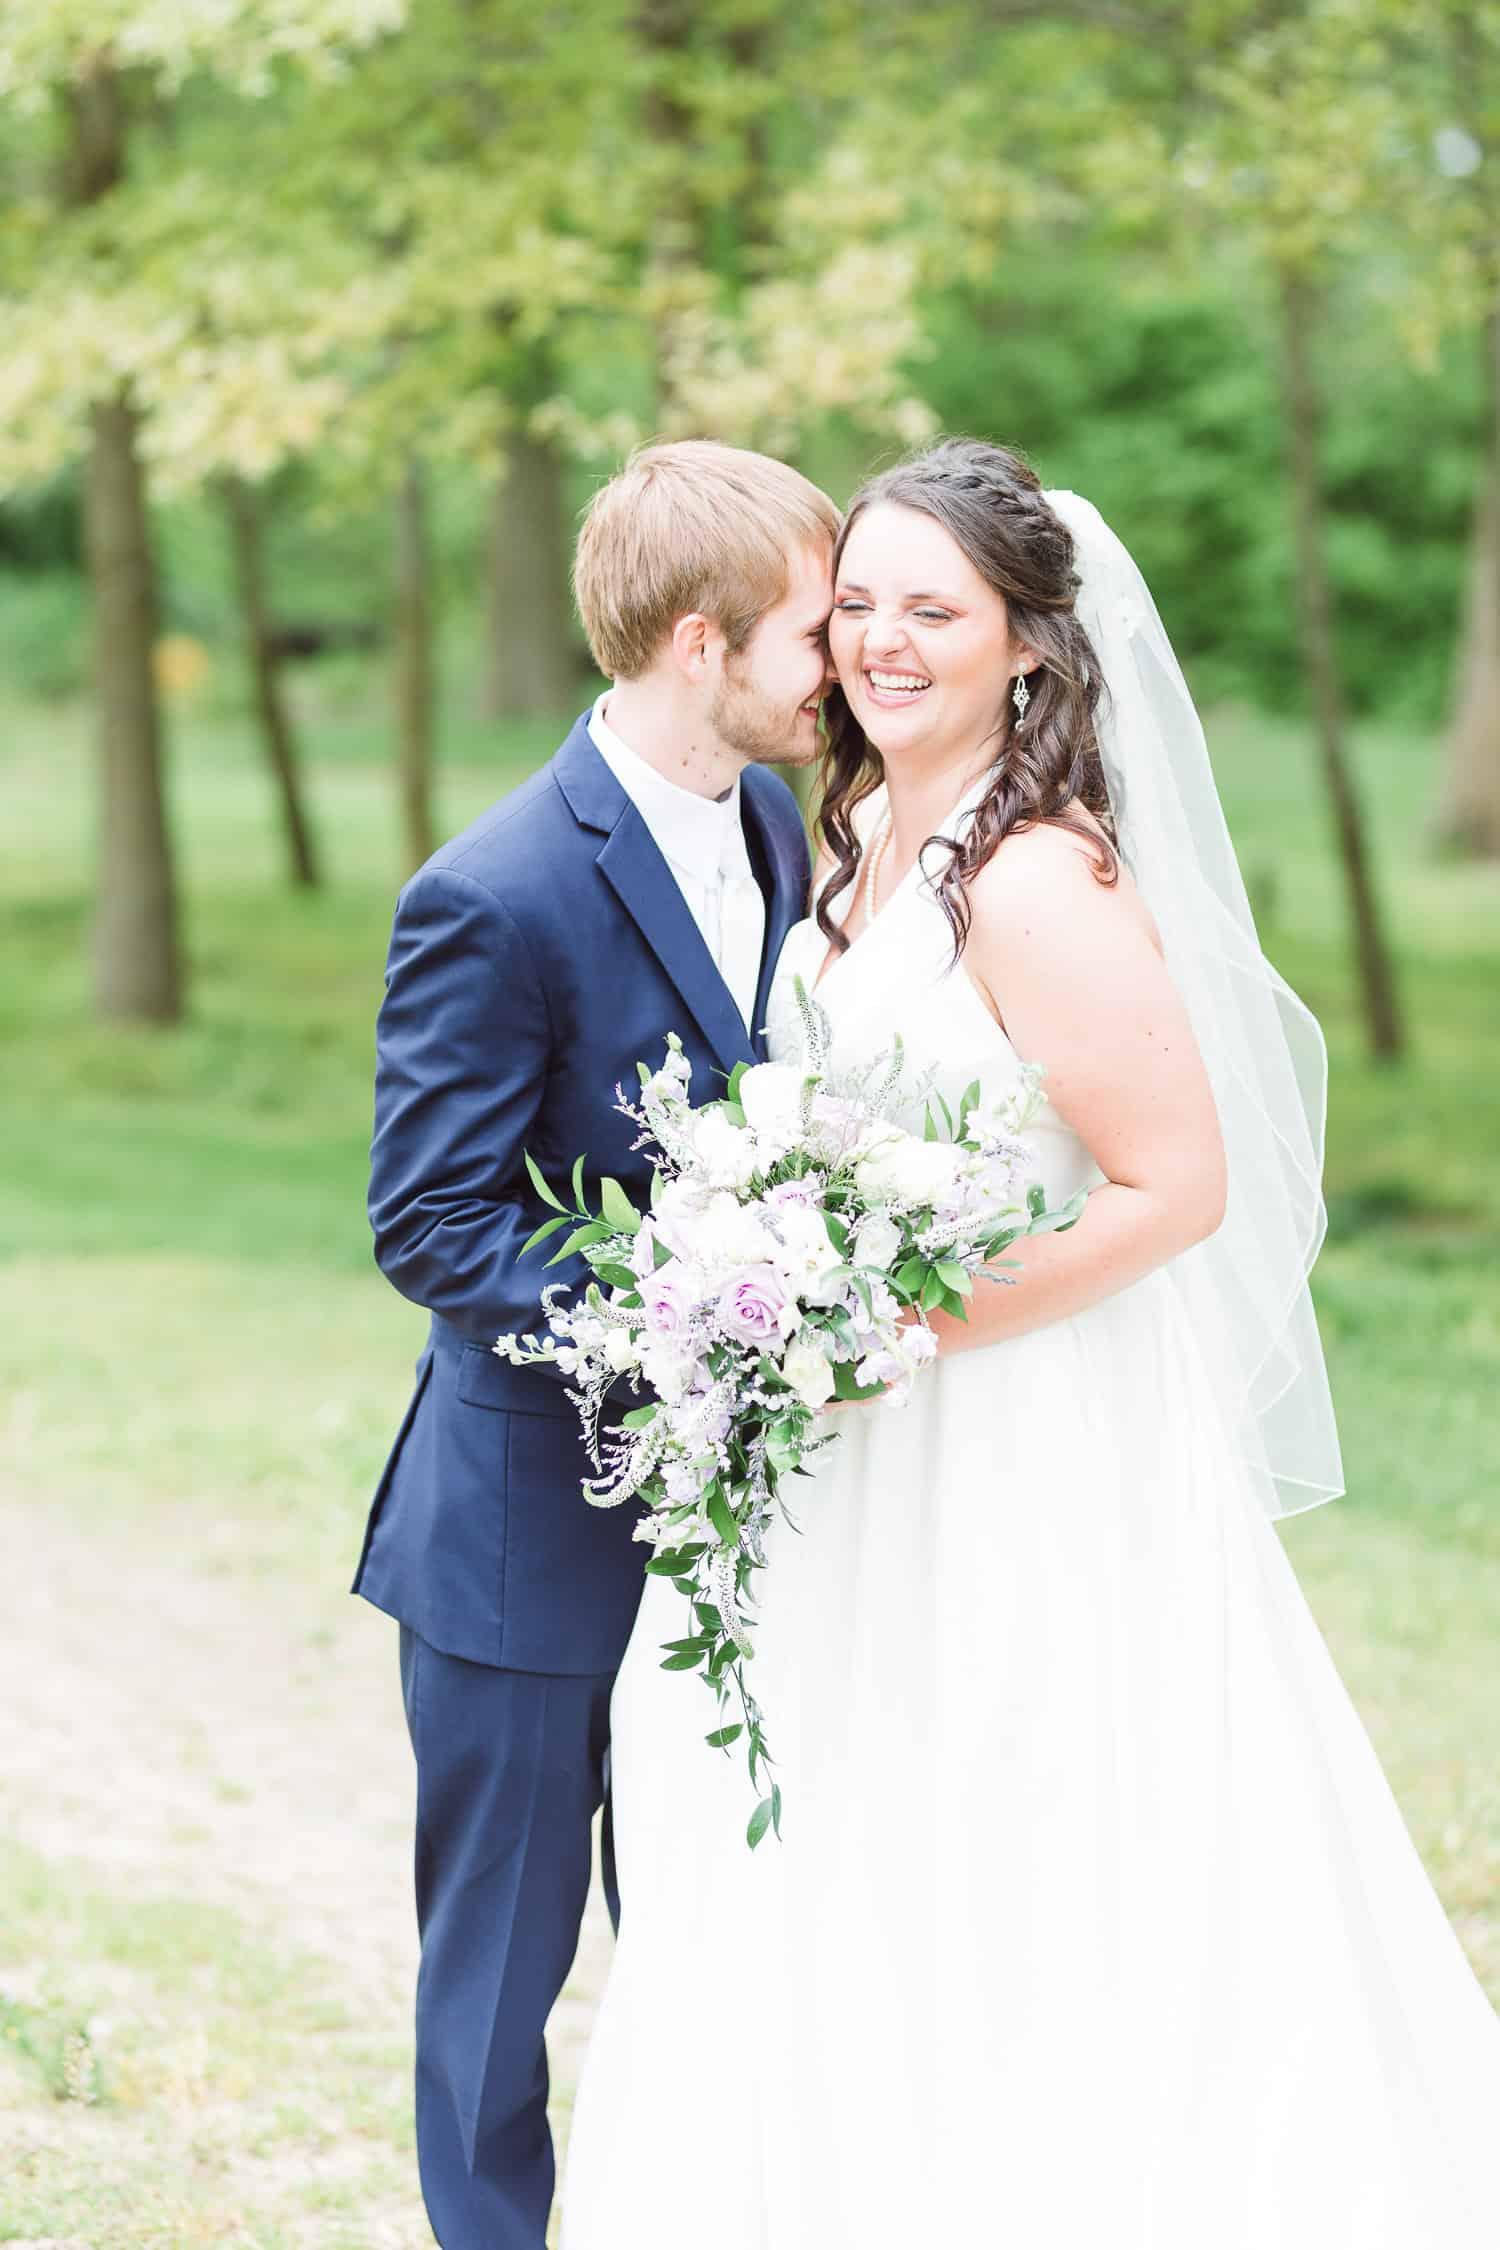 Bride and Groom portraits at St. Joe wedding